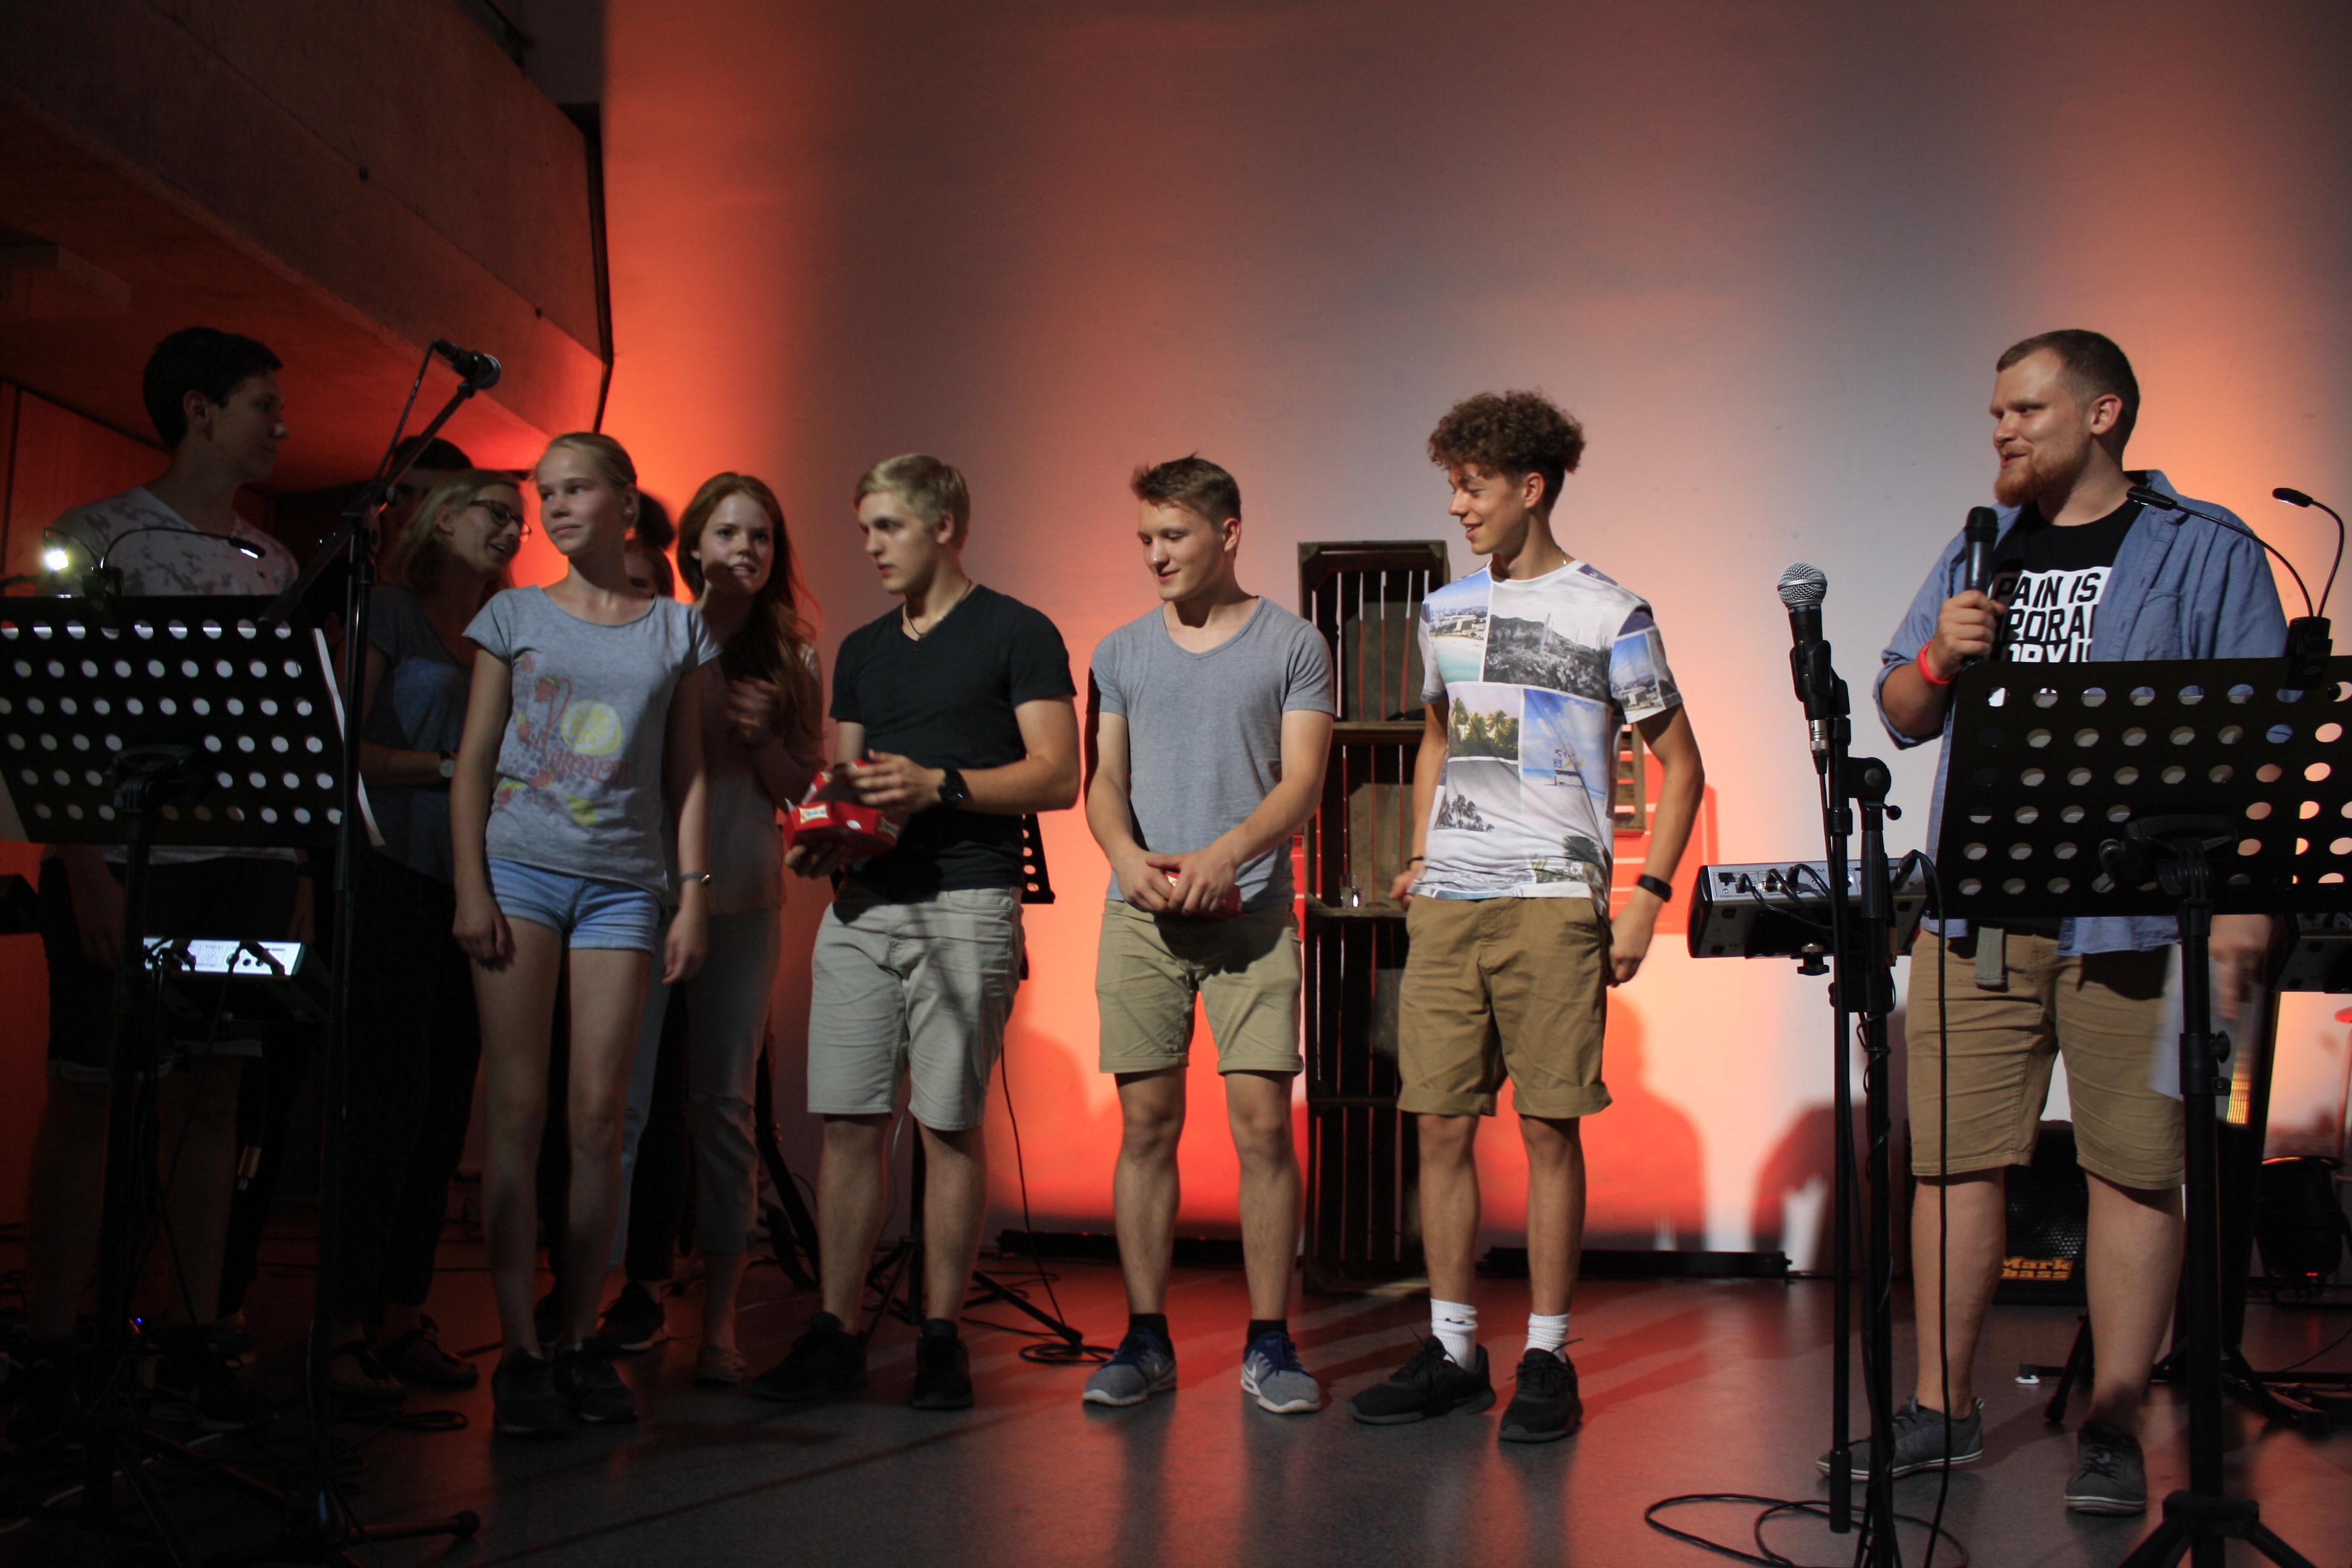 freie evangelische gemeinde frankfurt jugend gottesdienst inflame. Black Bedroom Furniture Sets. Home Design Ideas